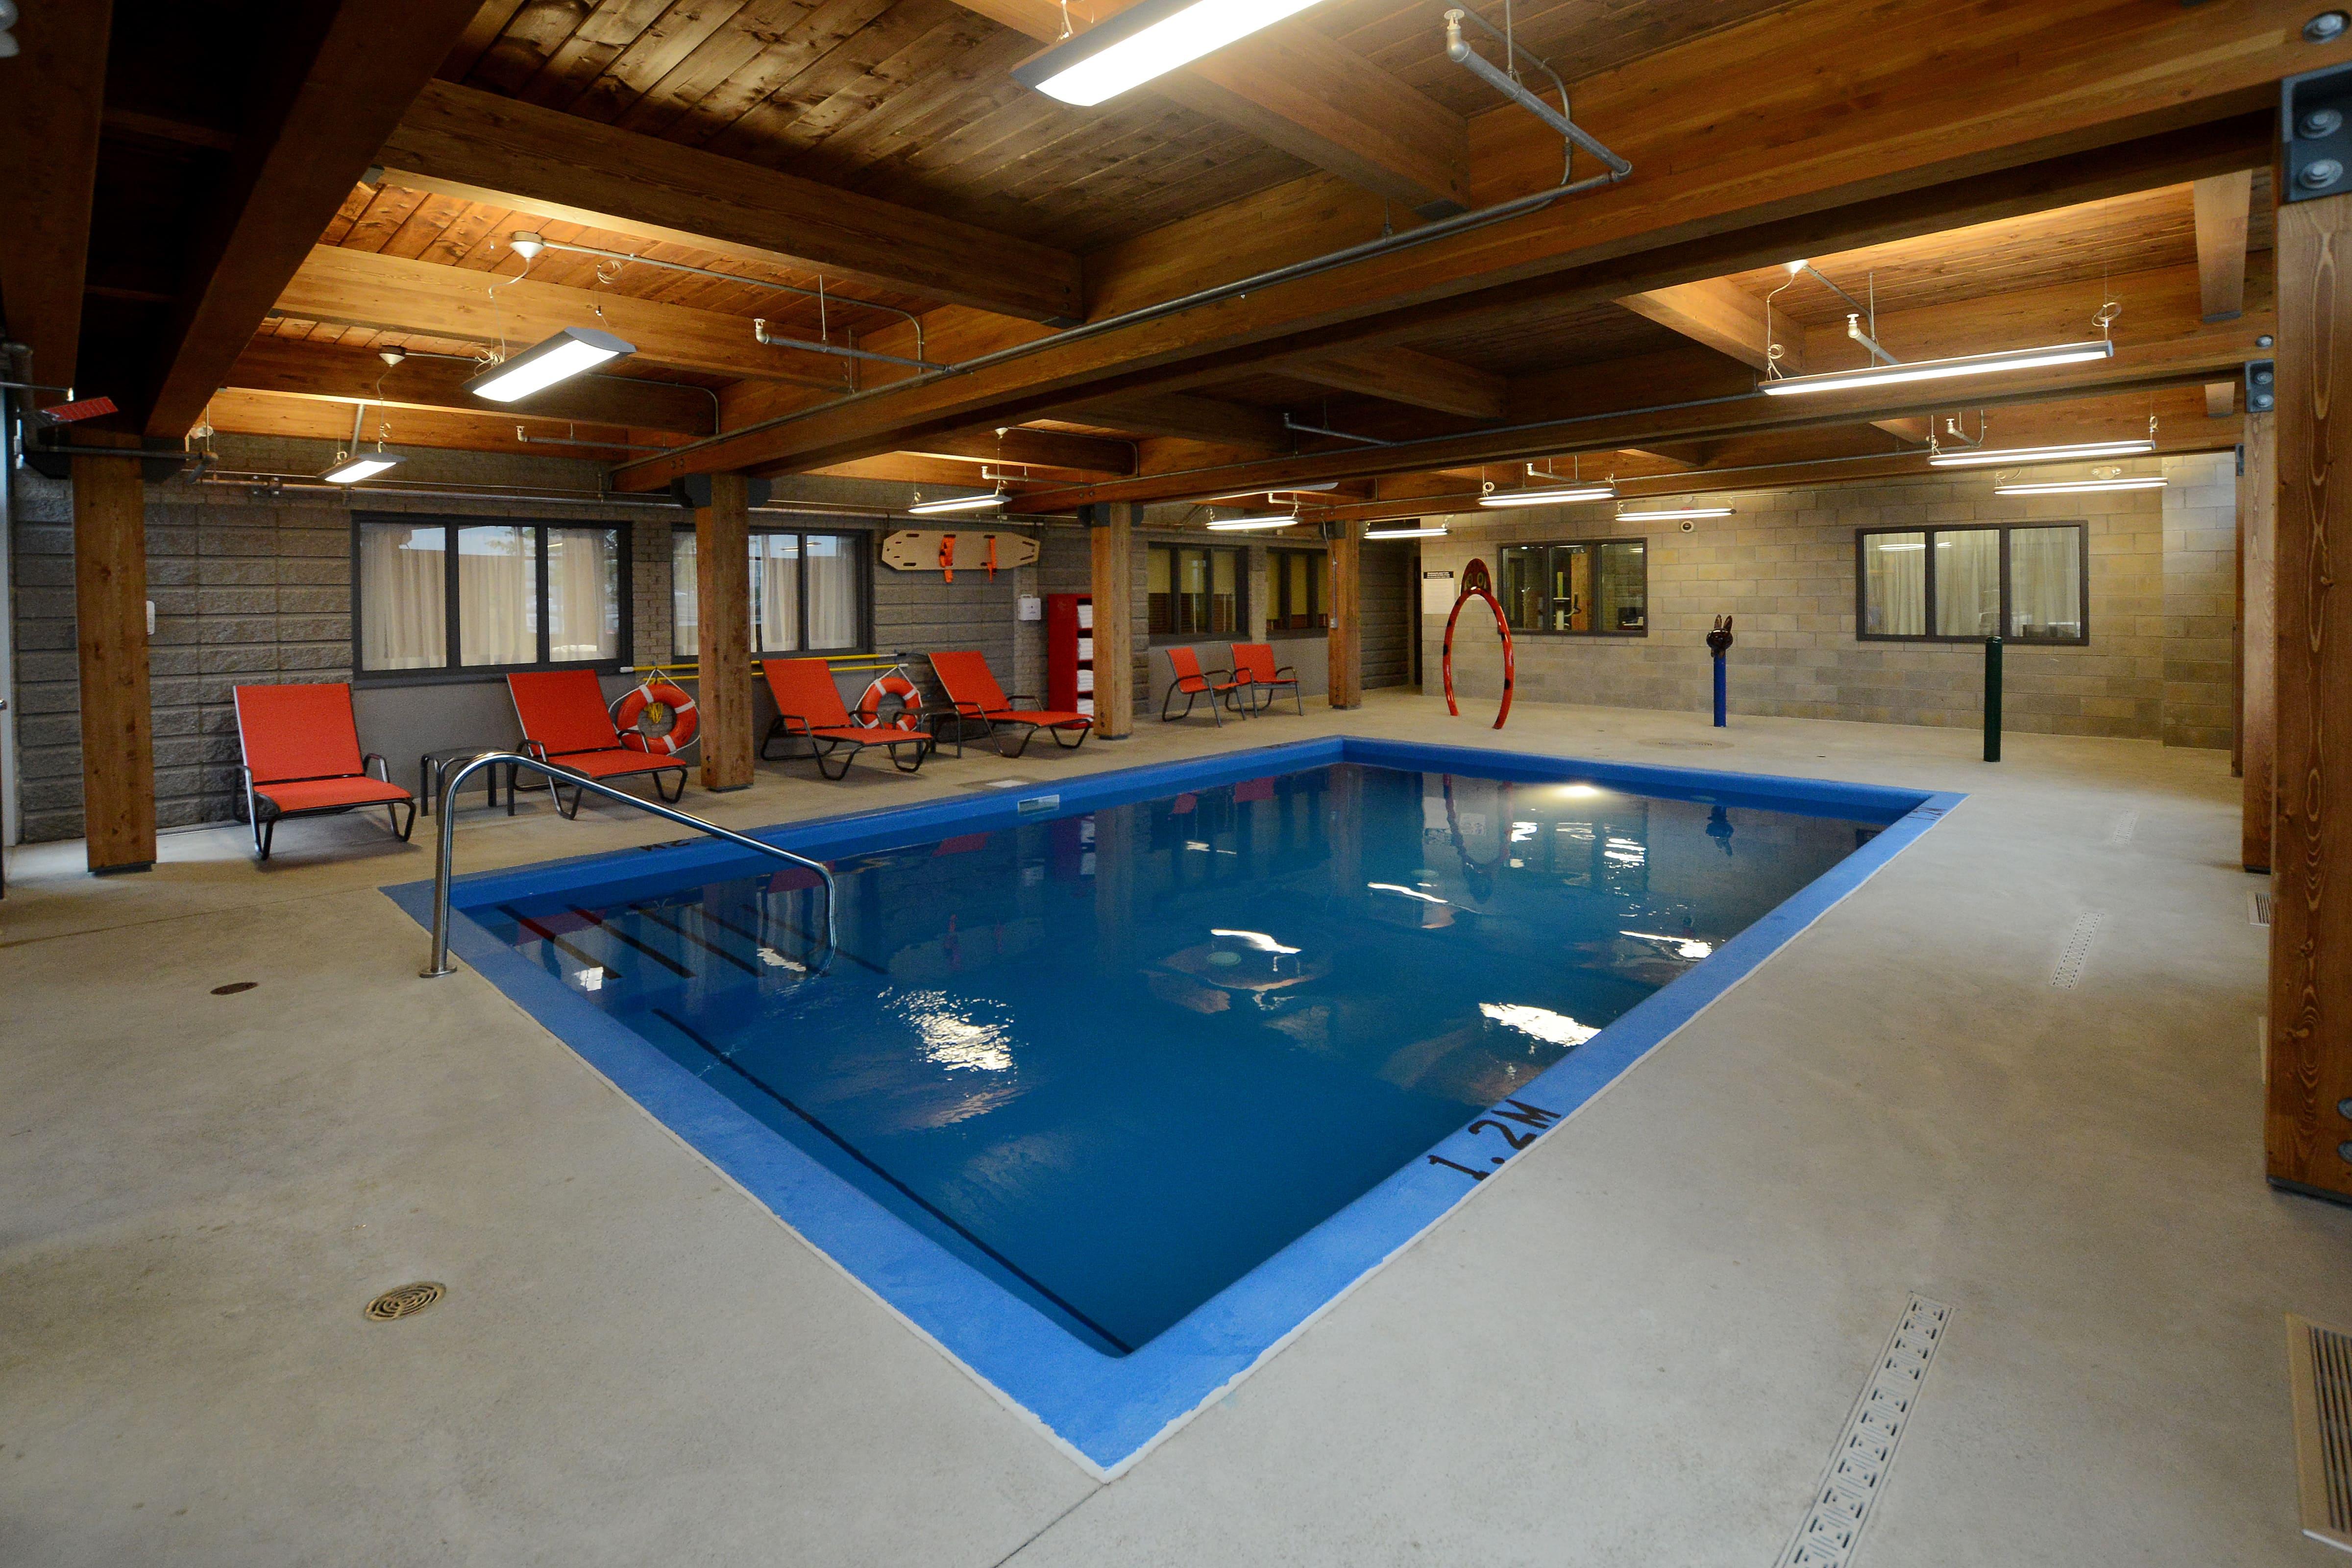 piscine salle de jeux hotel enfant quebec